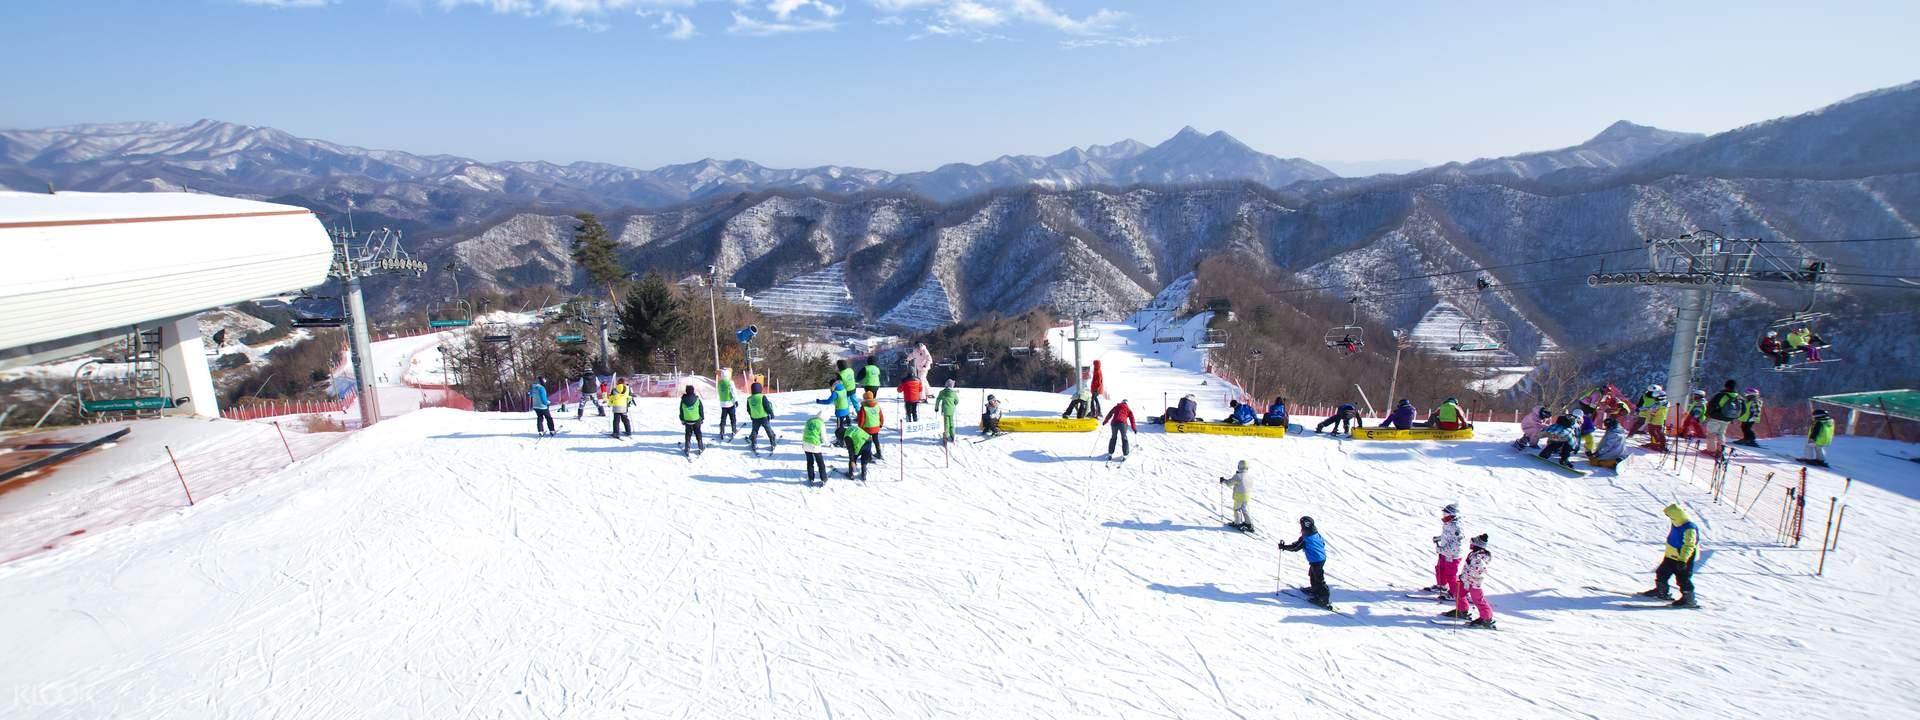 elysian gangchon ski resort day tour from gangwon-do (ktourstory